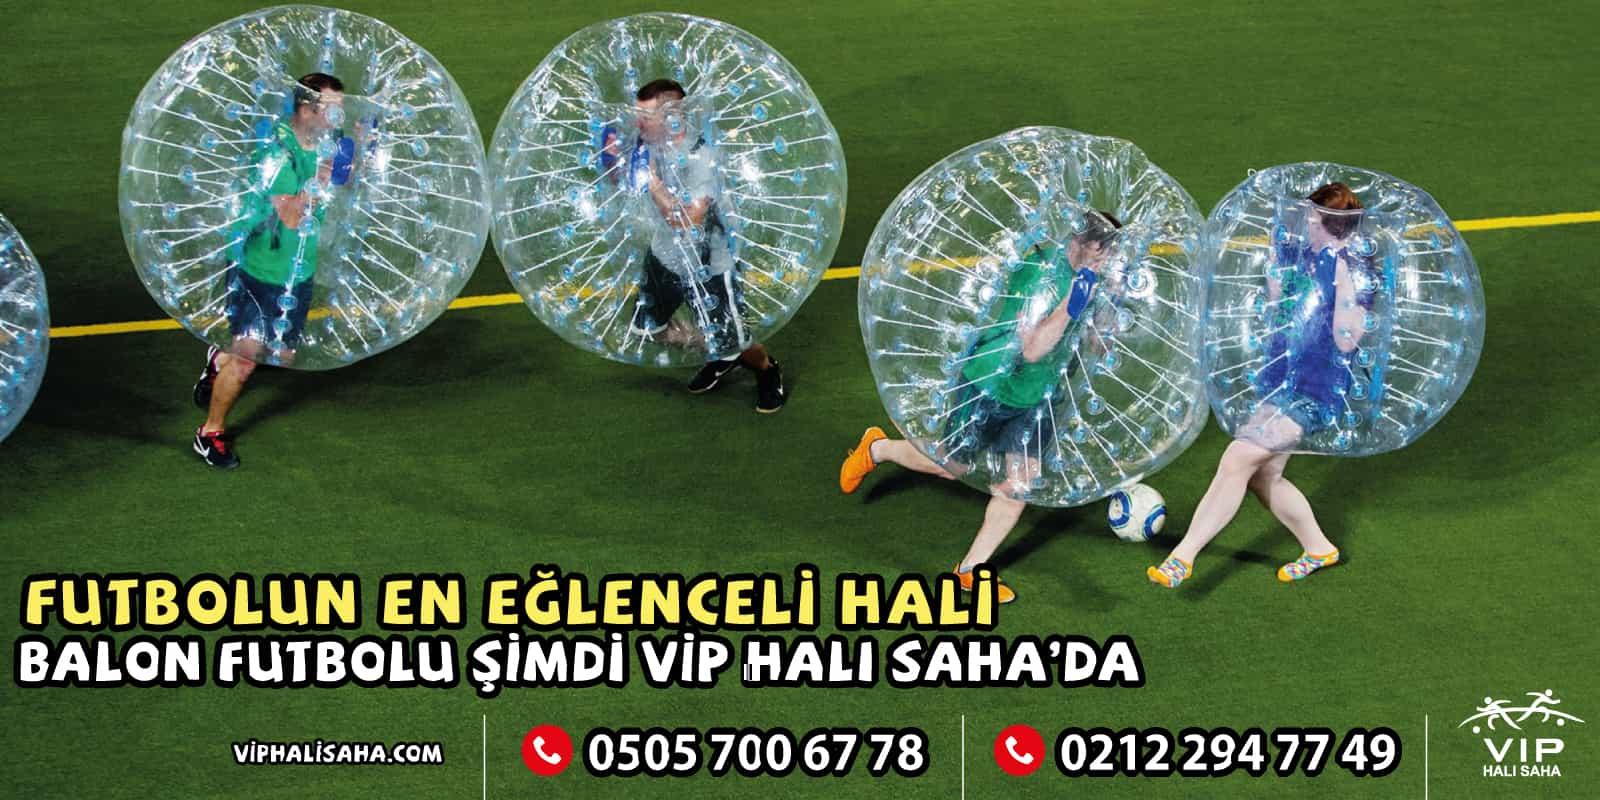 balon-futbolu